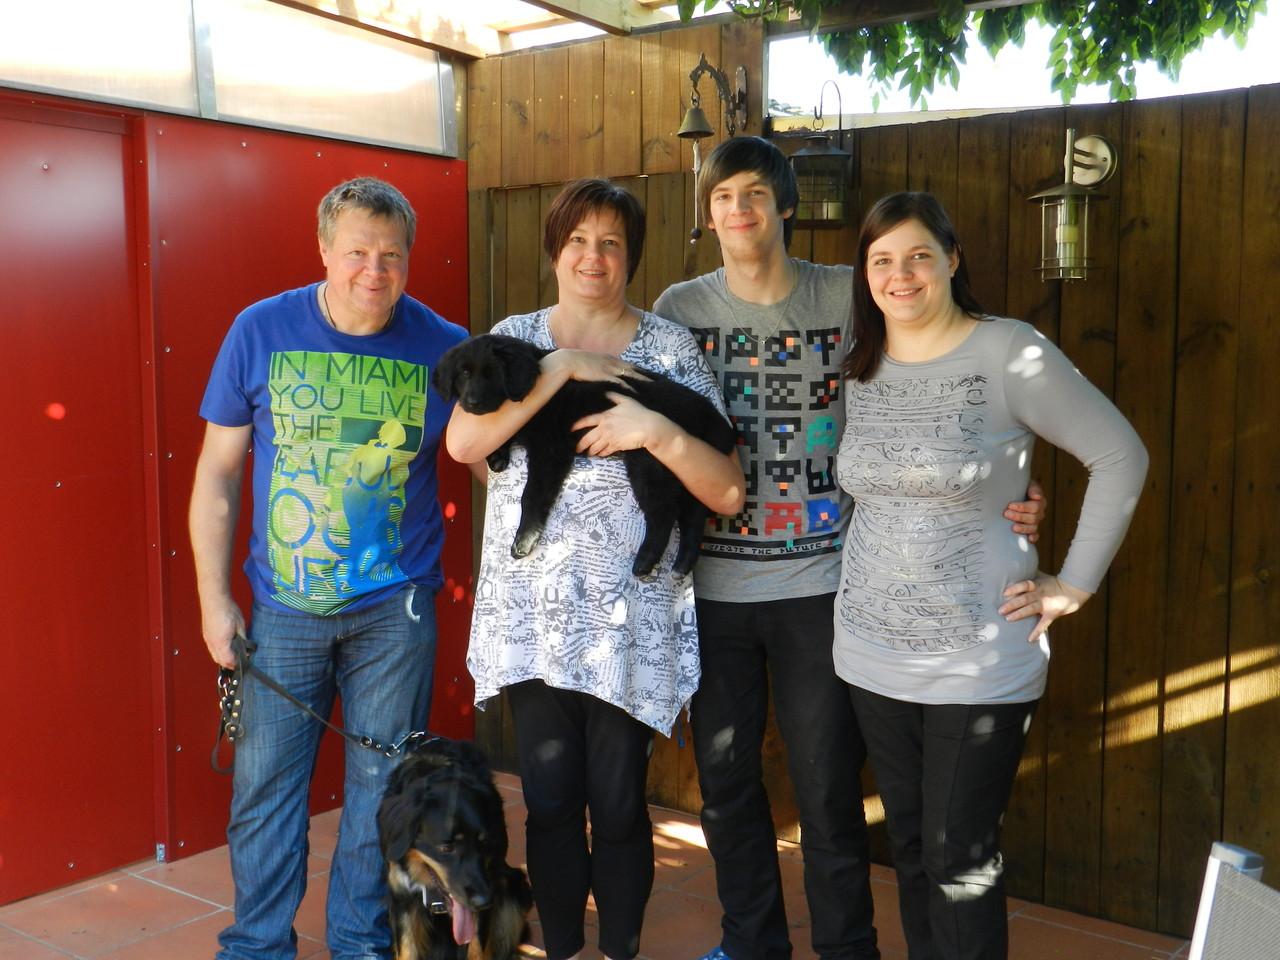 Dakyra und Familie (Stefan, Ulrike, Yannick u. Ann-Katrin)